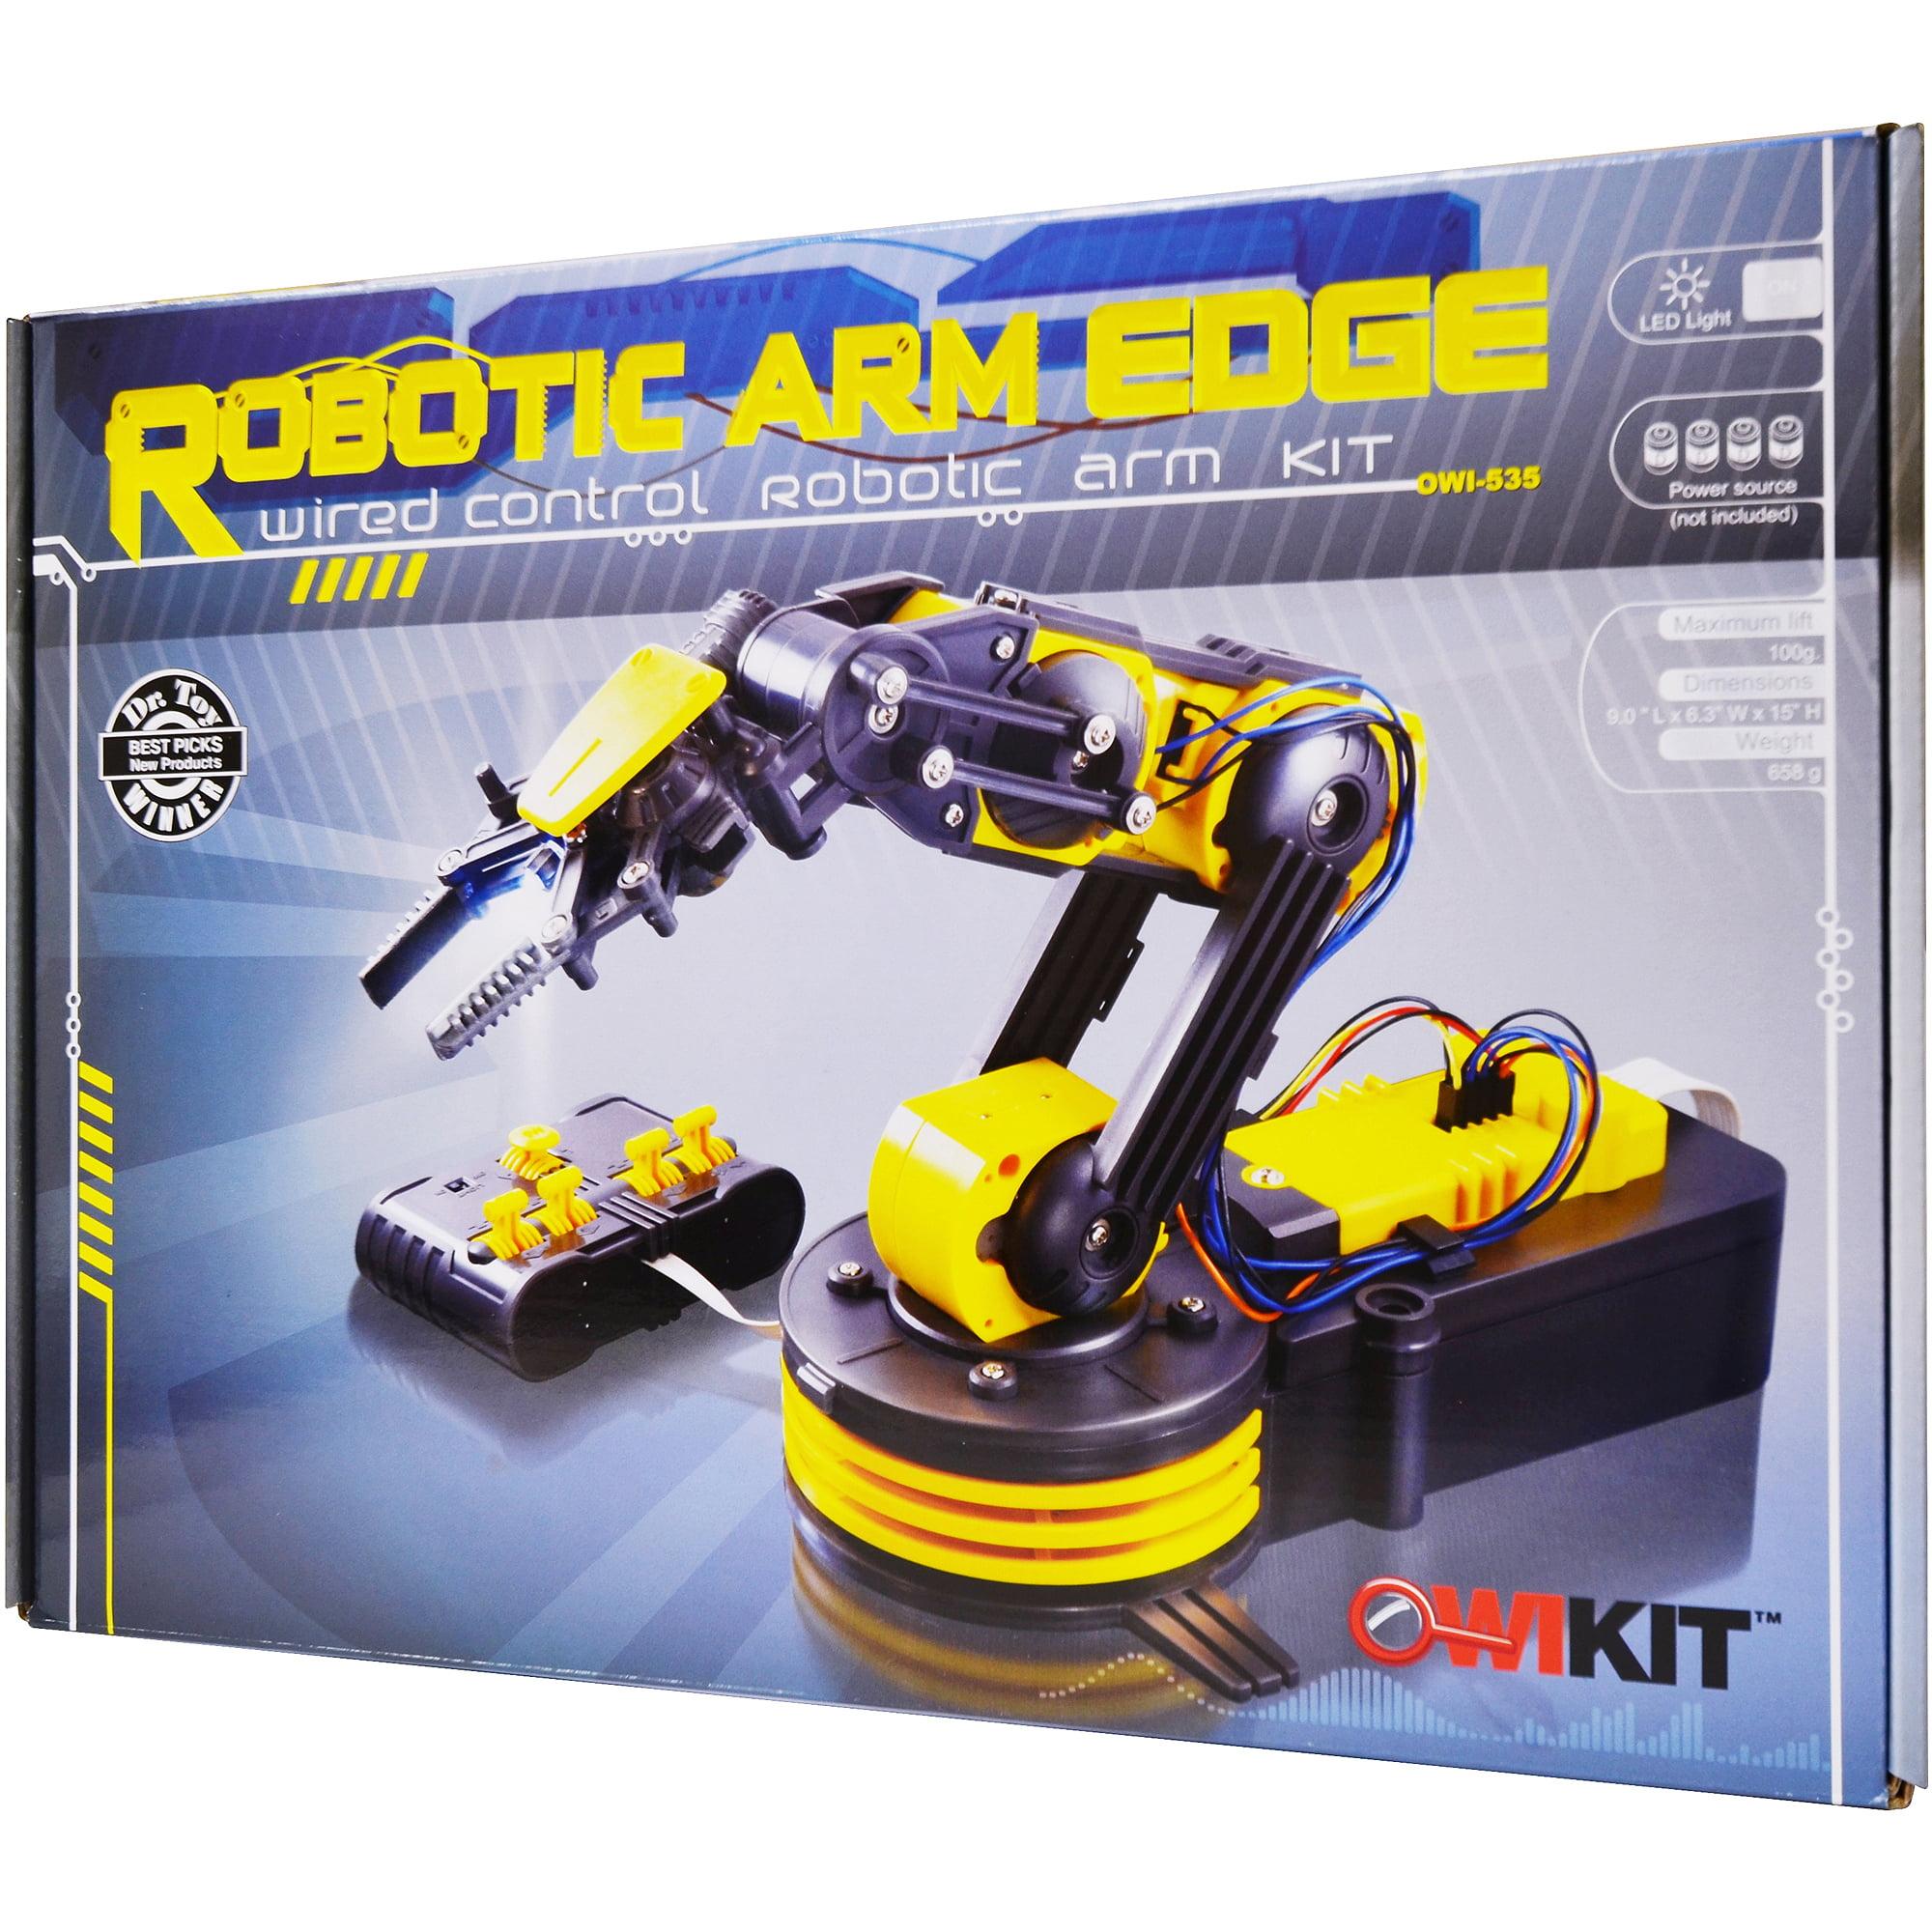 OWI Robotic Arm Edge - Walmart.com